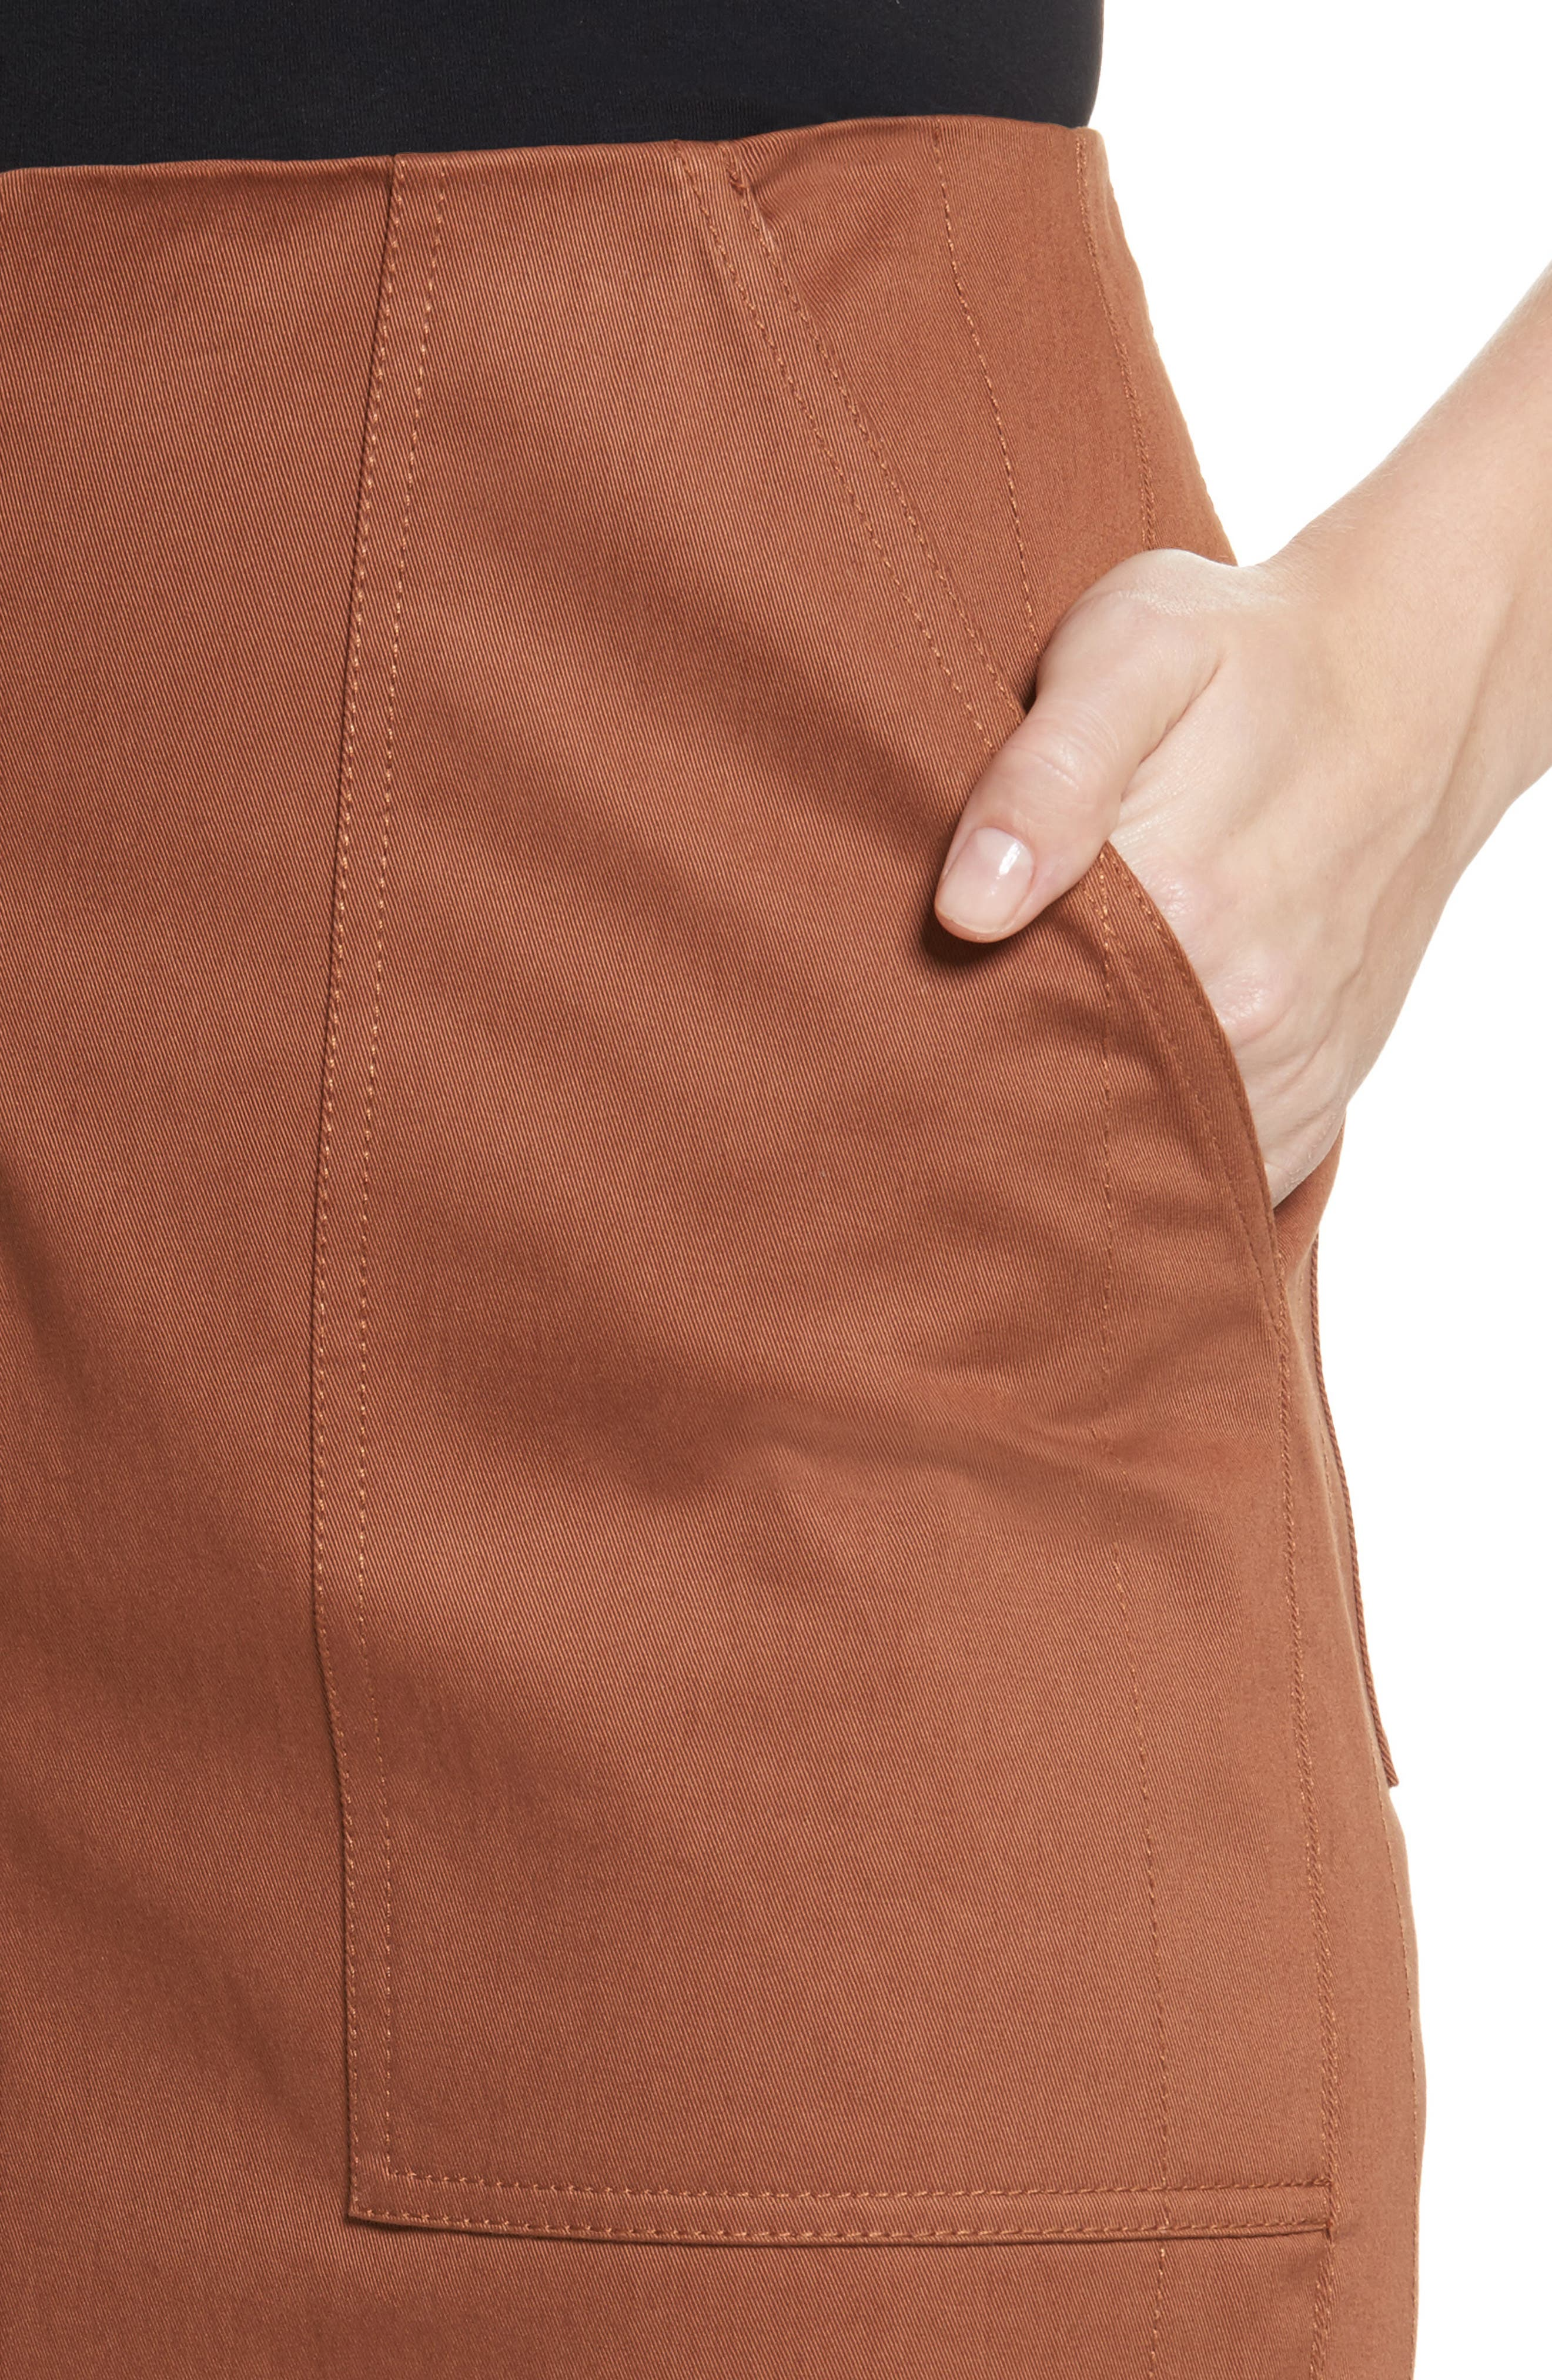 Diane von Furstenberg Midi Twill Pencil Skirt,                             Alternate thumbnail 4, color,                             203